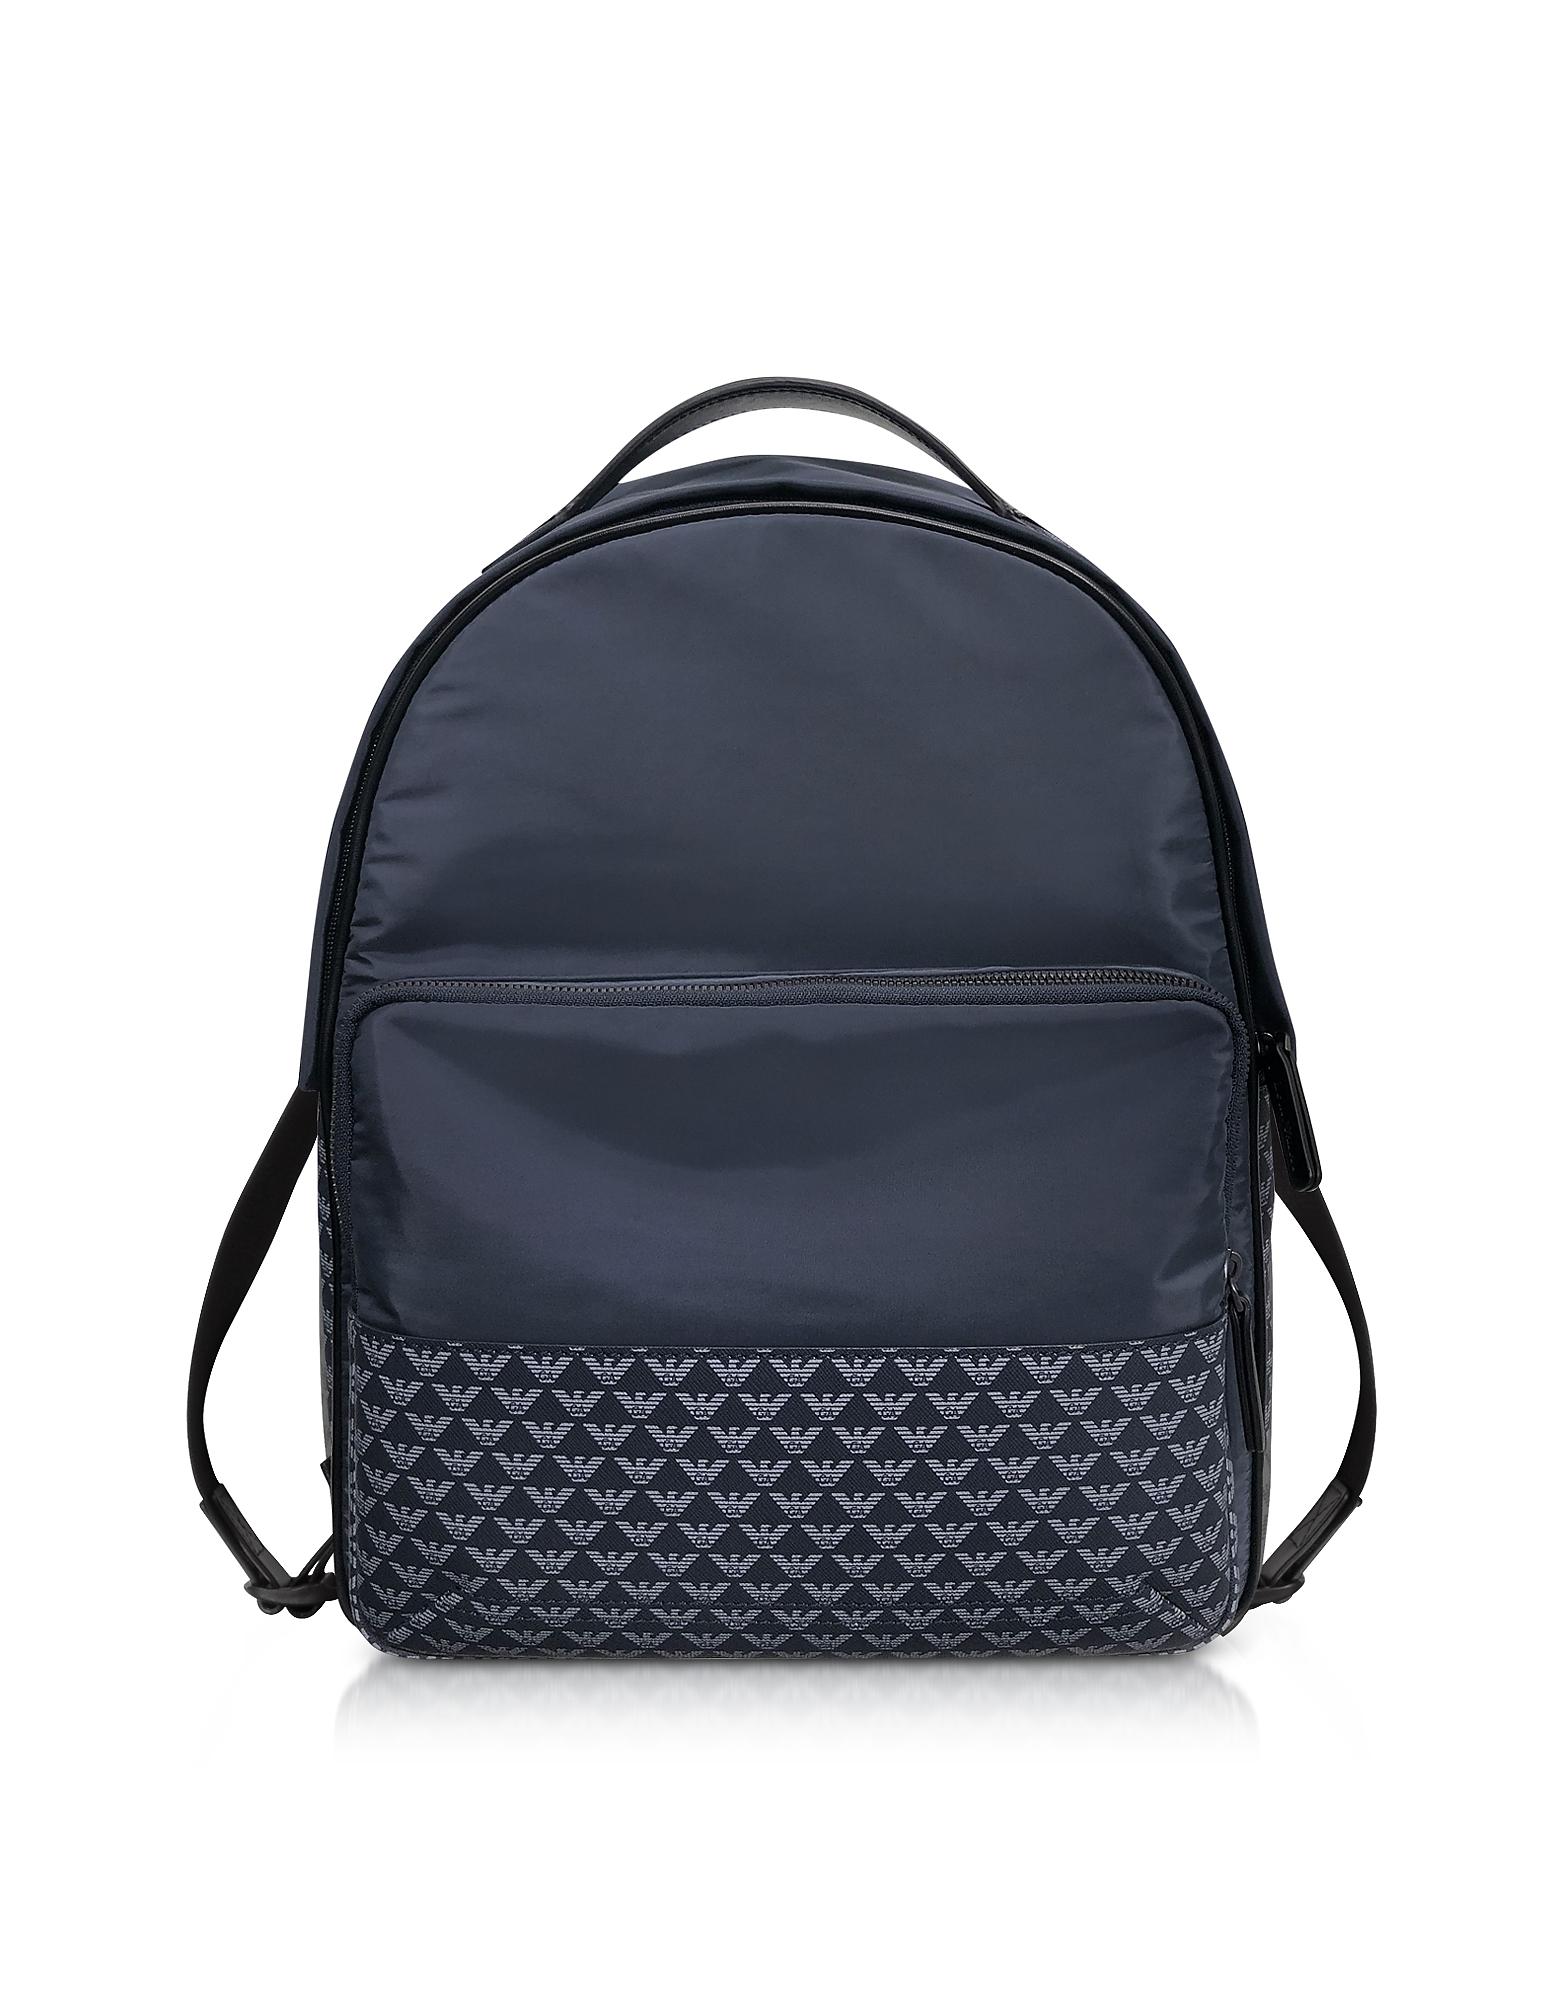 Allover Iconic Eagle Nylon Backpack, Blue/navy